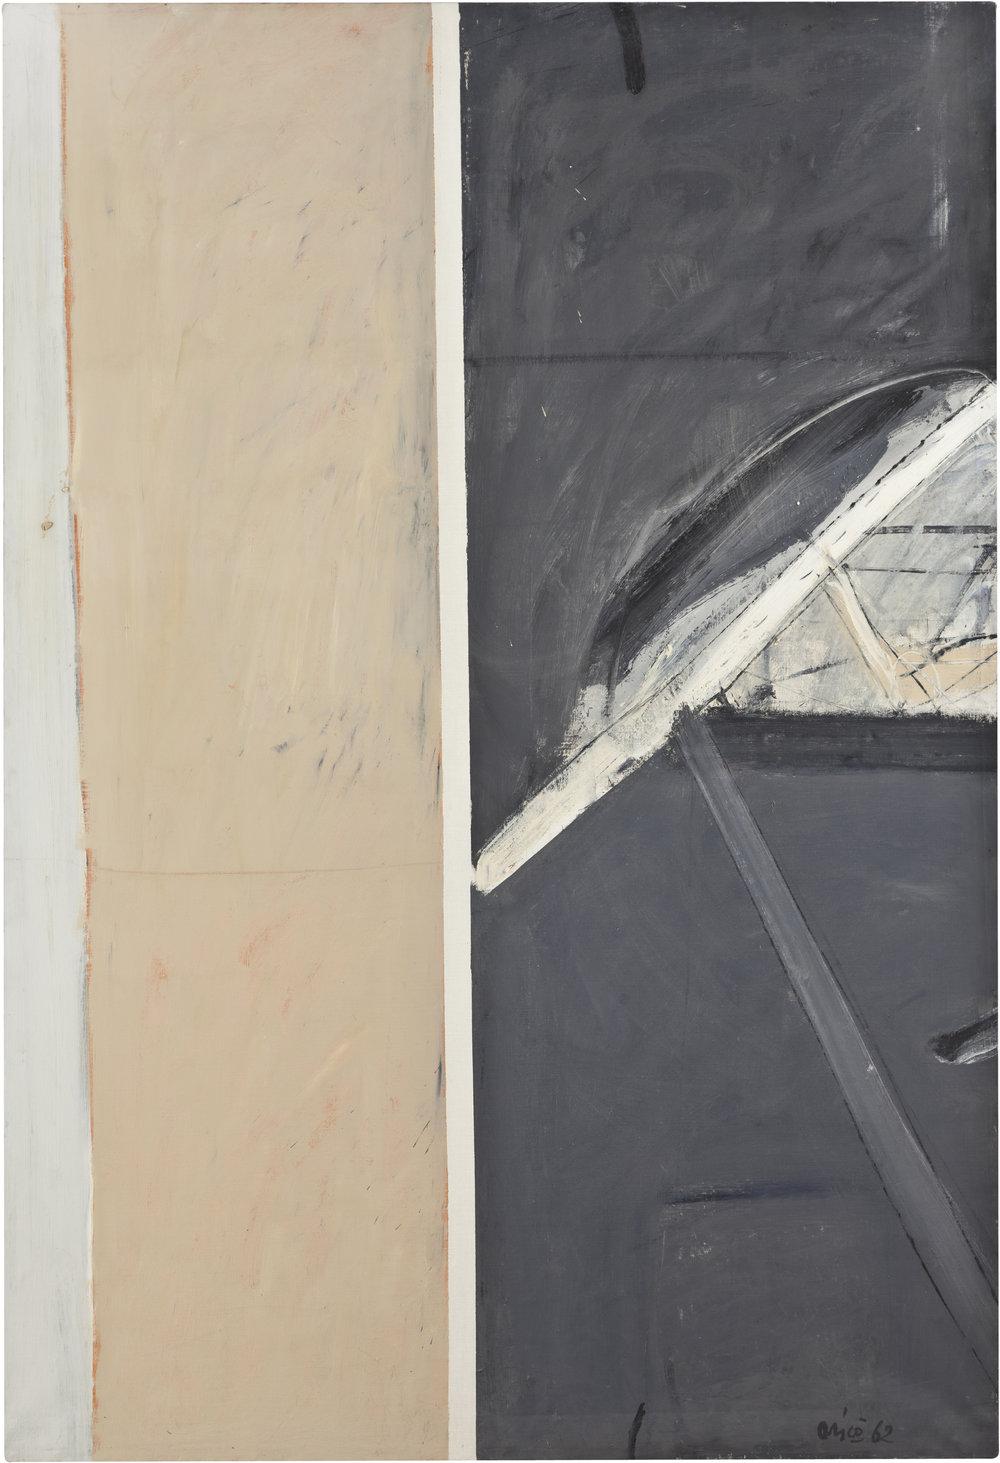 Rodolfo Aricò_Interno esterno _Olio su tela_1962_200 x 138 cm.jpg